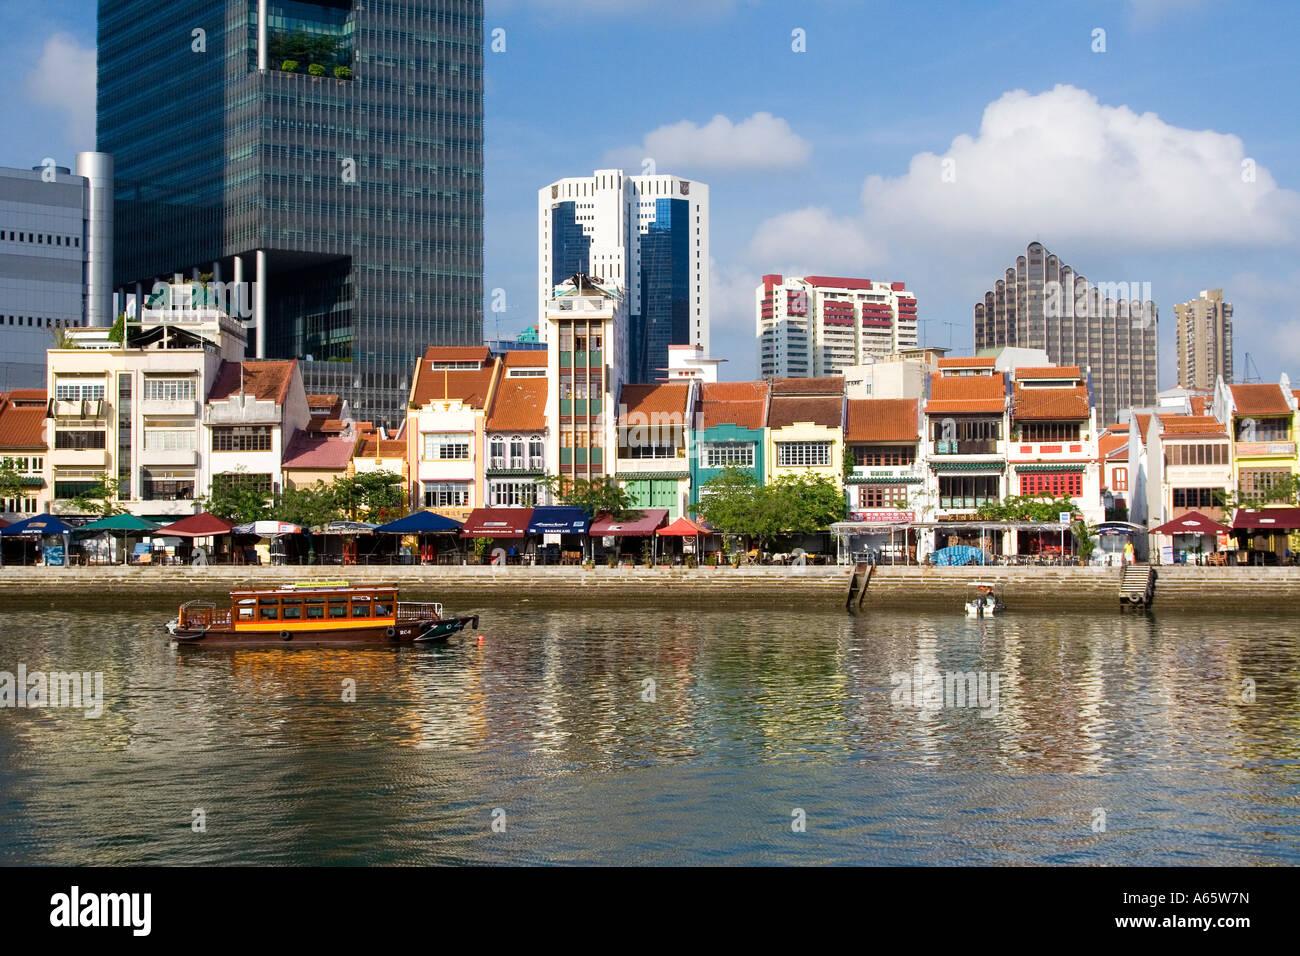 Chinese Shophouses on Boat Quay Singapore Stock Photo